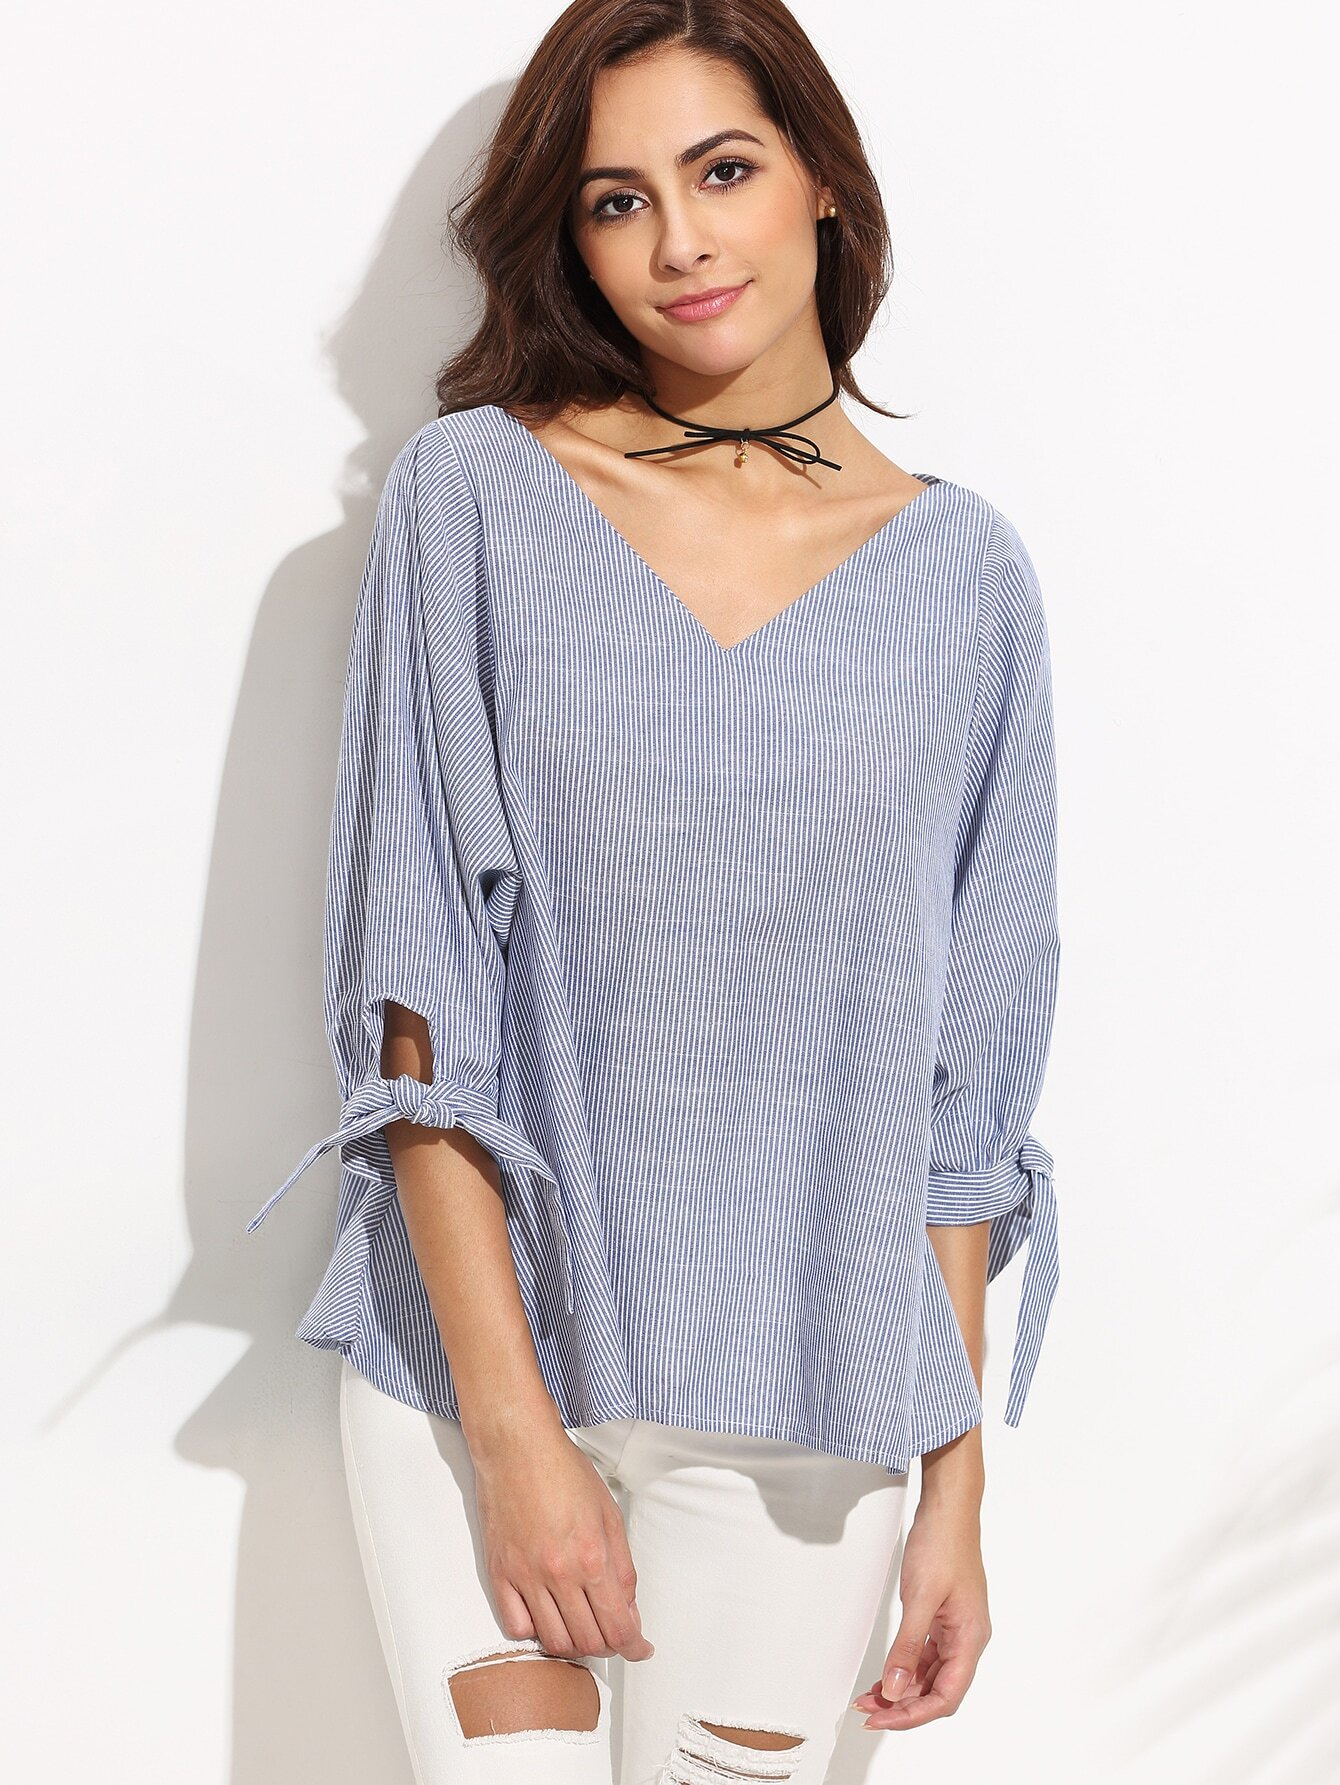 Blue Vertical Striped Tie Sleeve Blouse blouse160726104